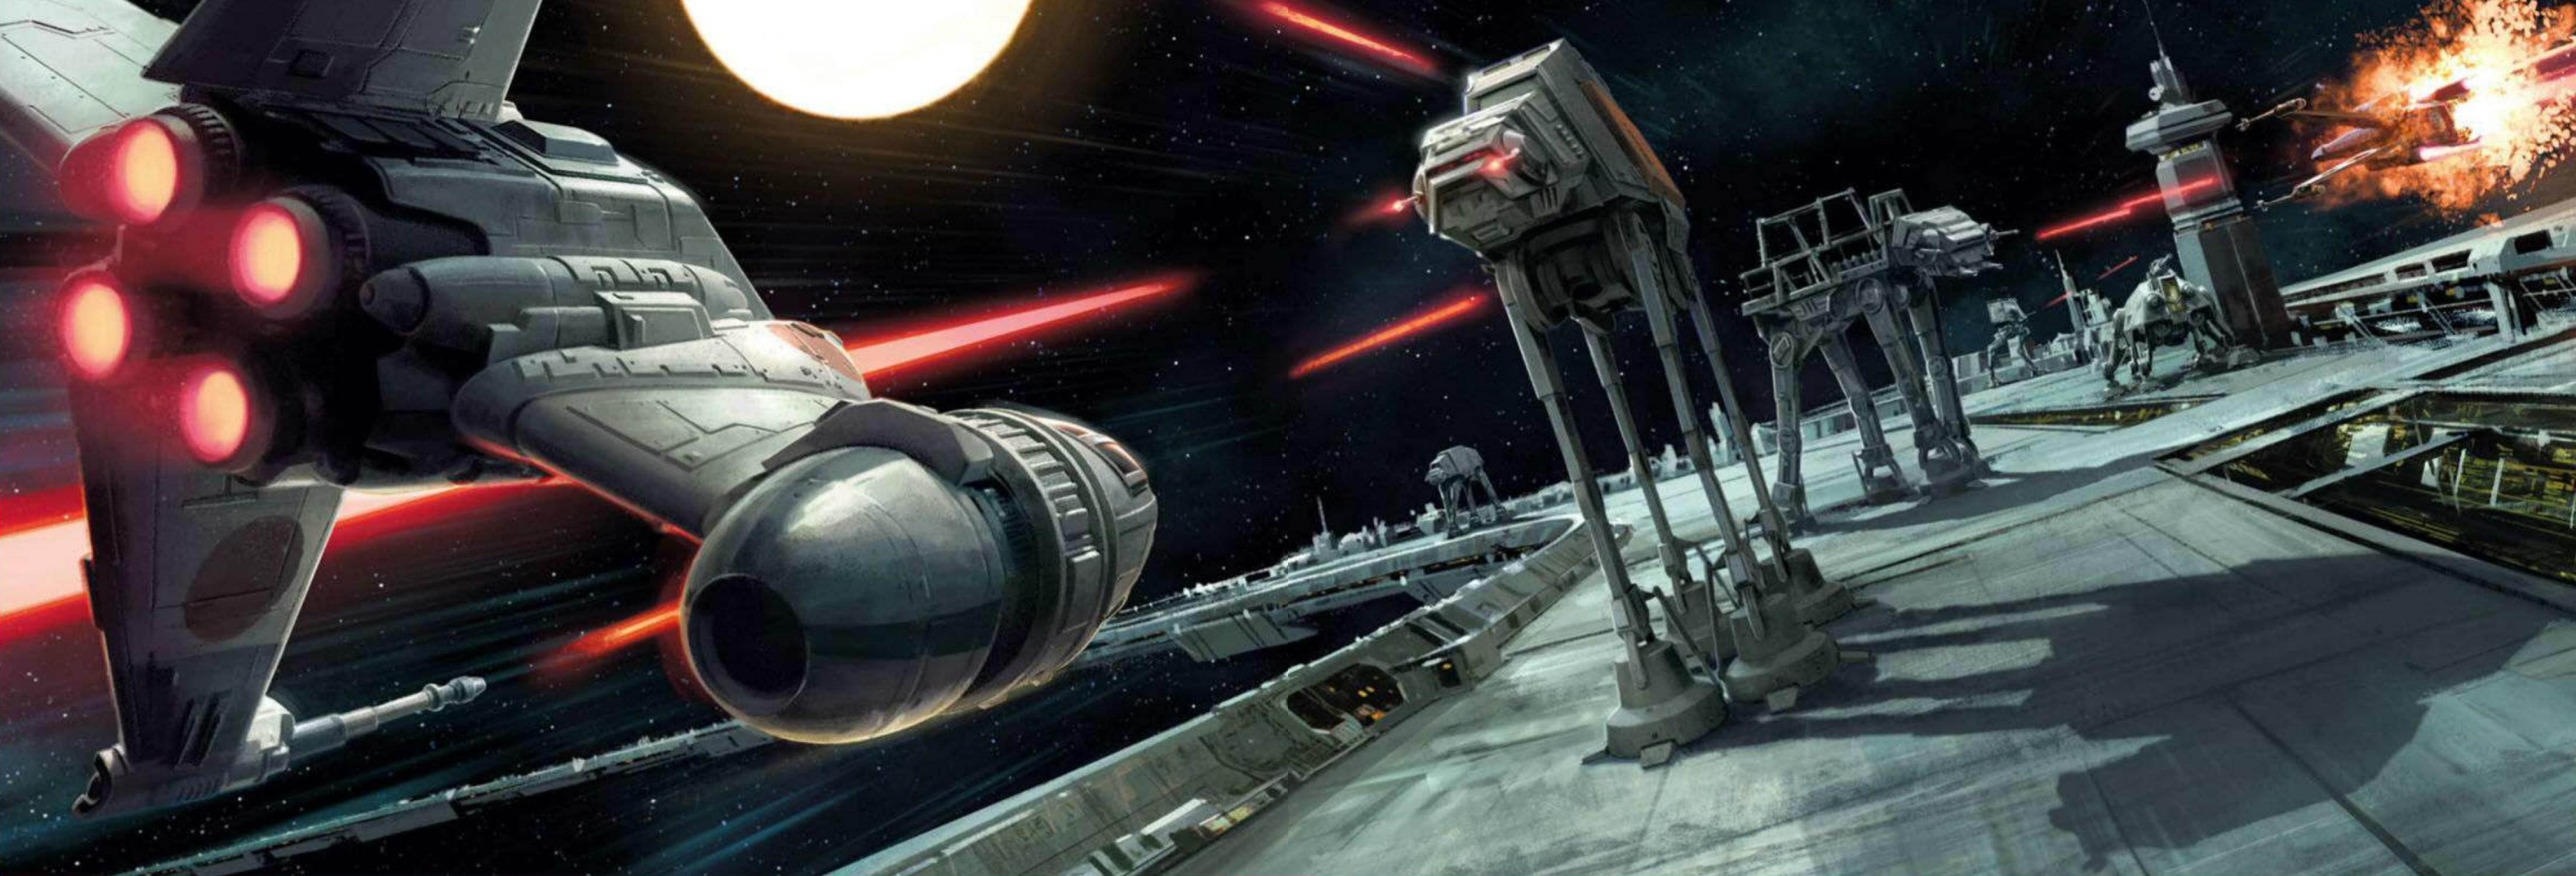 Galactic Civil War | Wookieepedia | FANDOM powered by Wikia